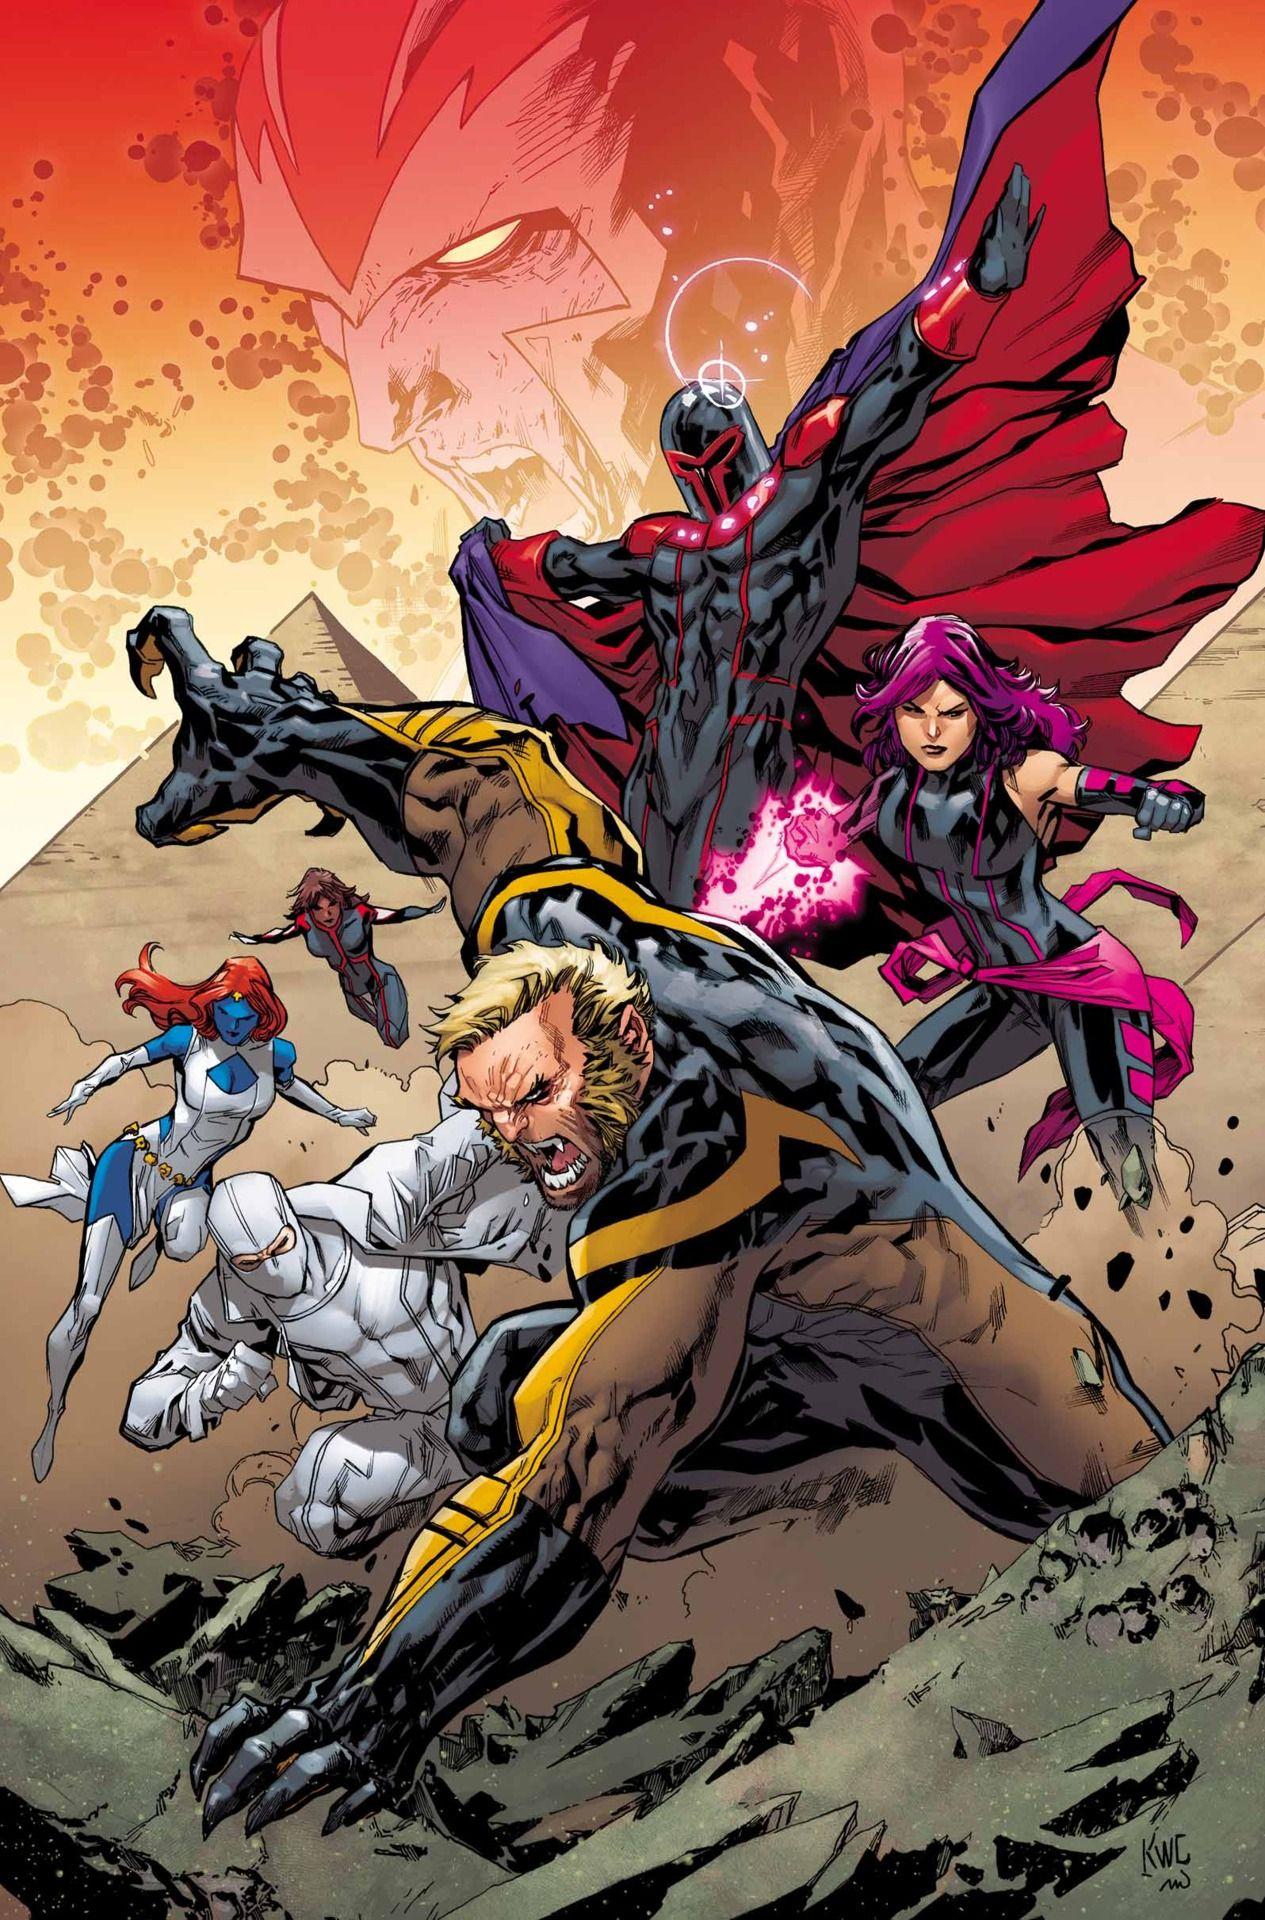 Marvel Comics April 2016 Covers and Solicitations - Comic